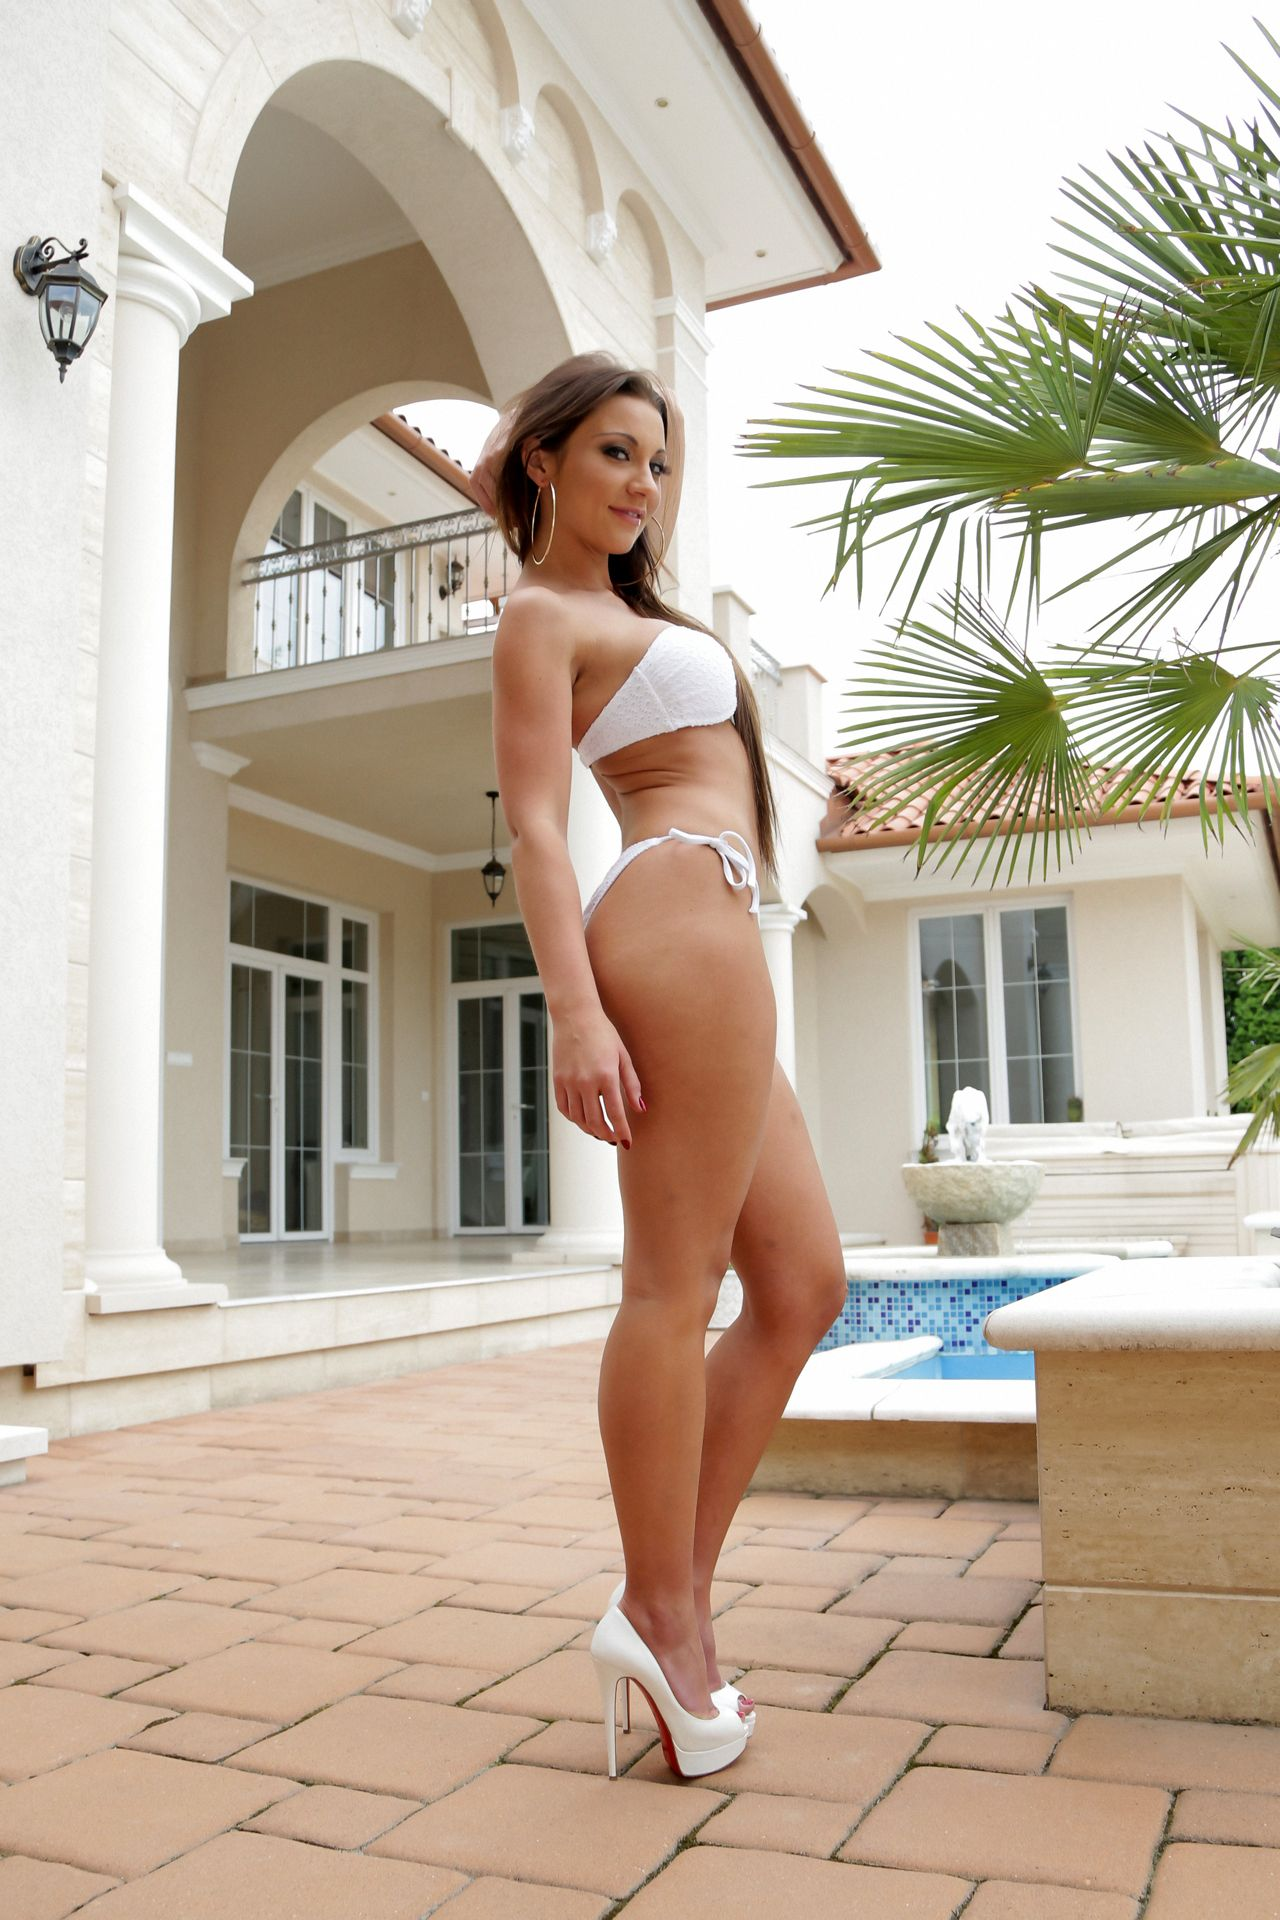 high heels and Bikini